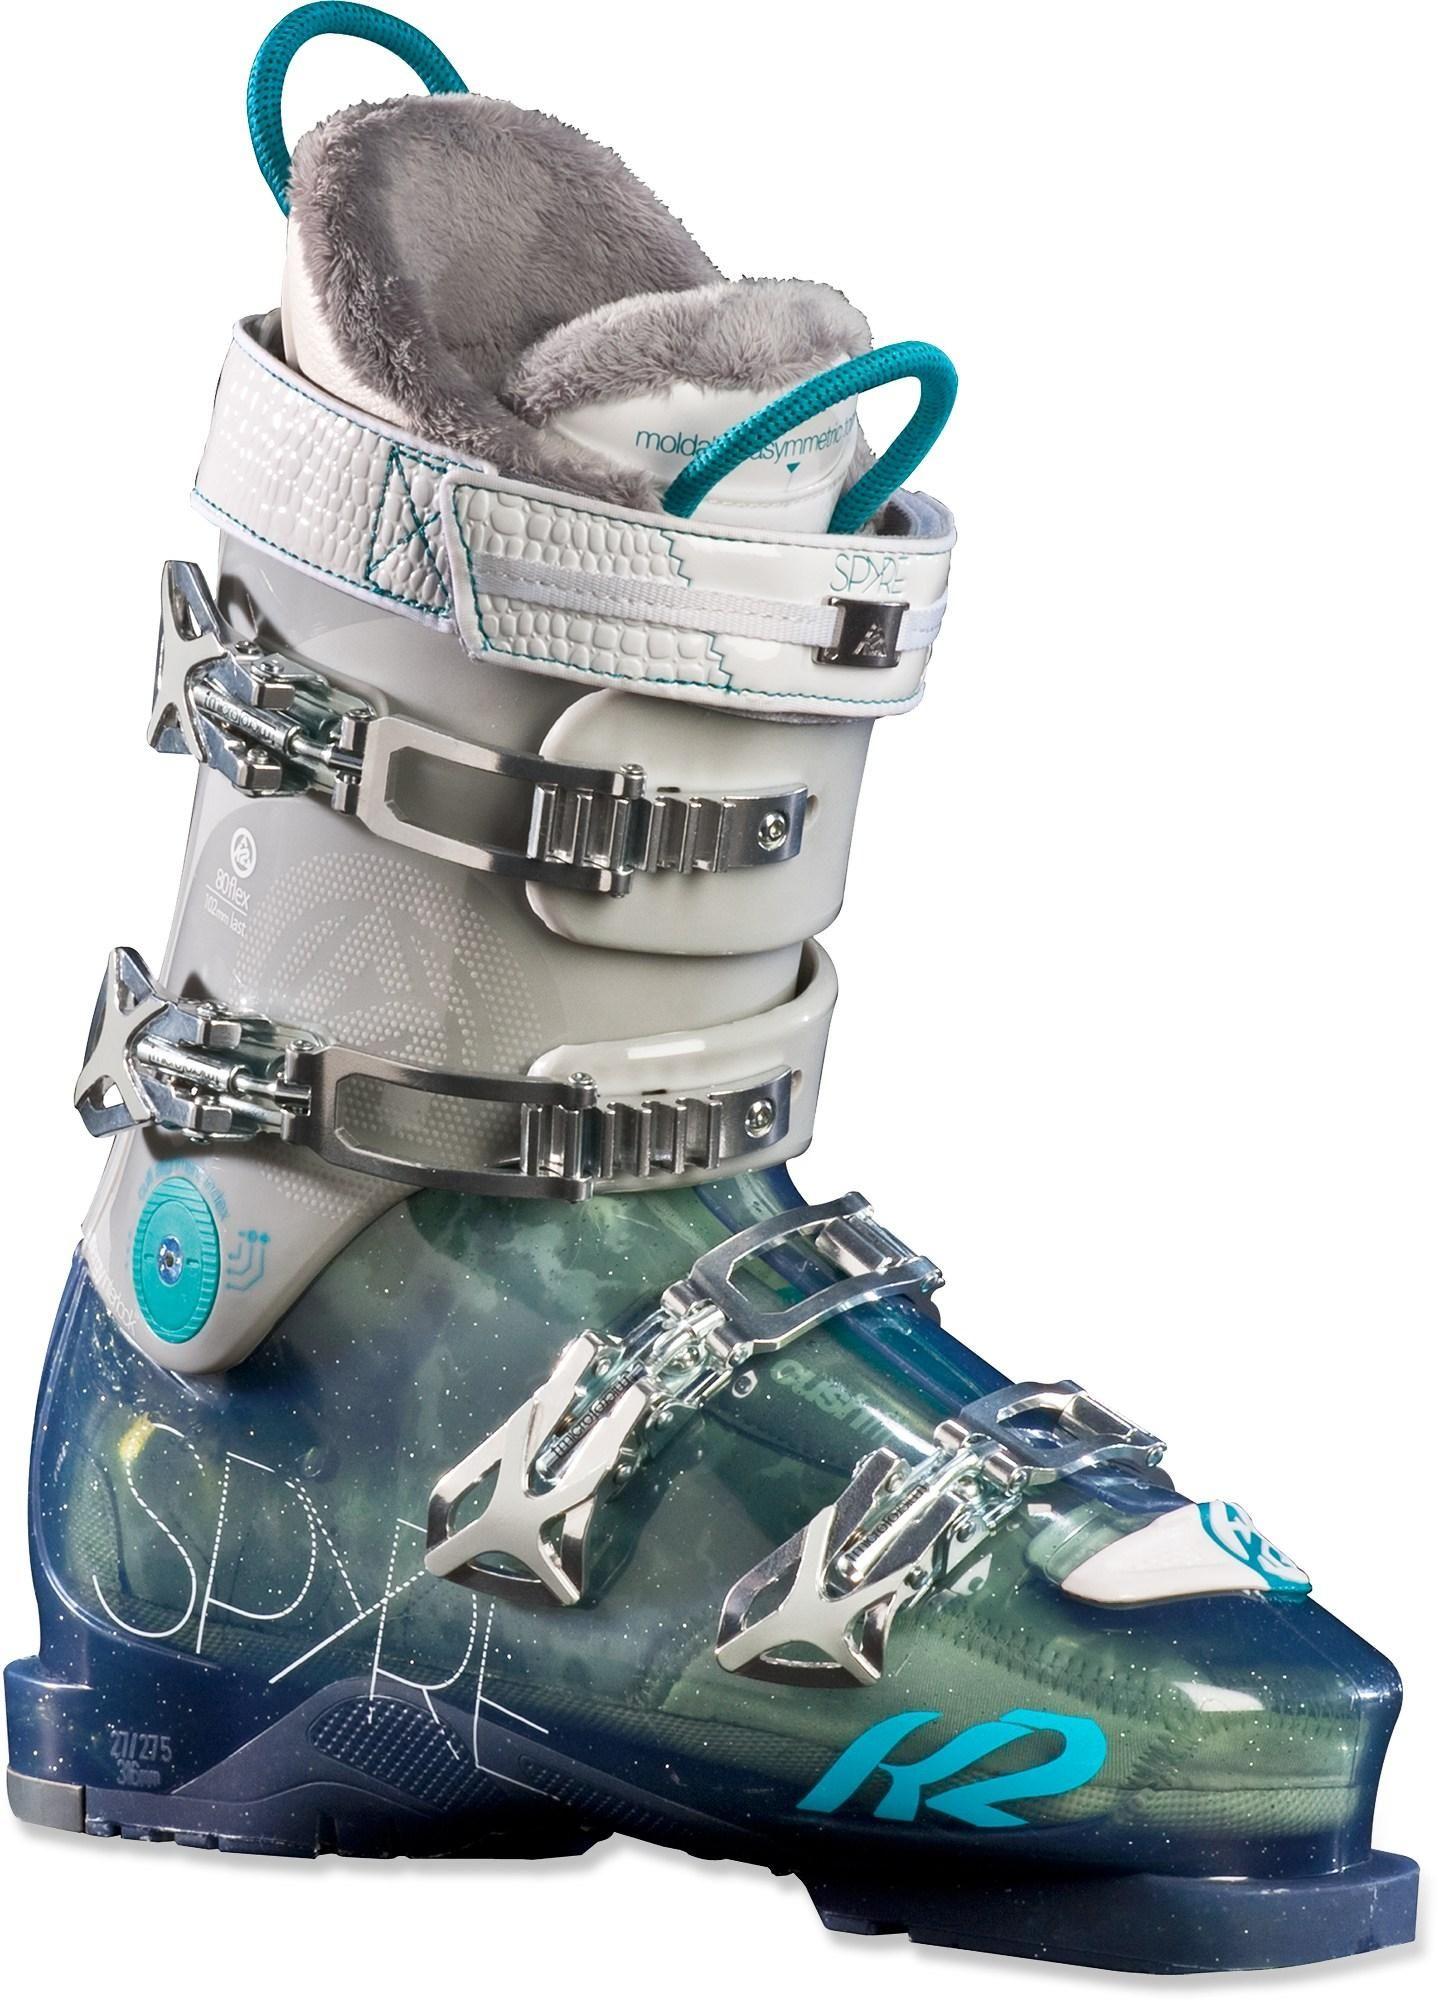 K2 Spyre 80 Ski Boots Women S 2013 2014 Rei Co Op Skiing Ski Boots Ski Snowboard